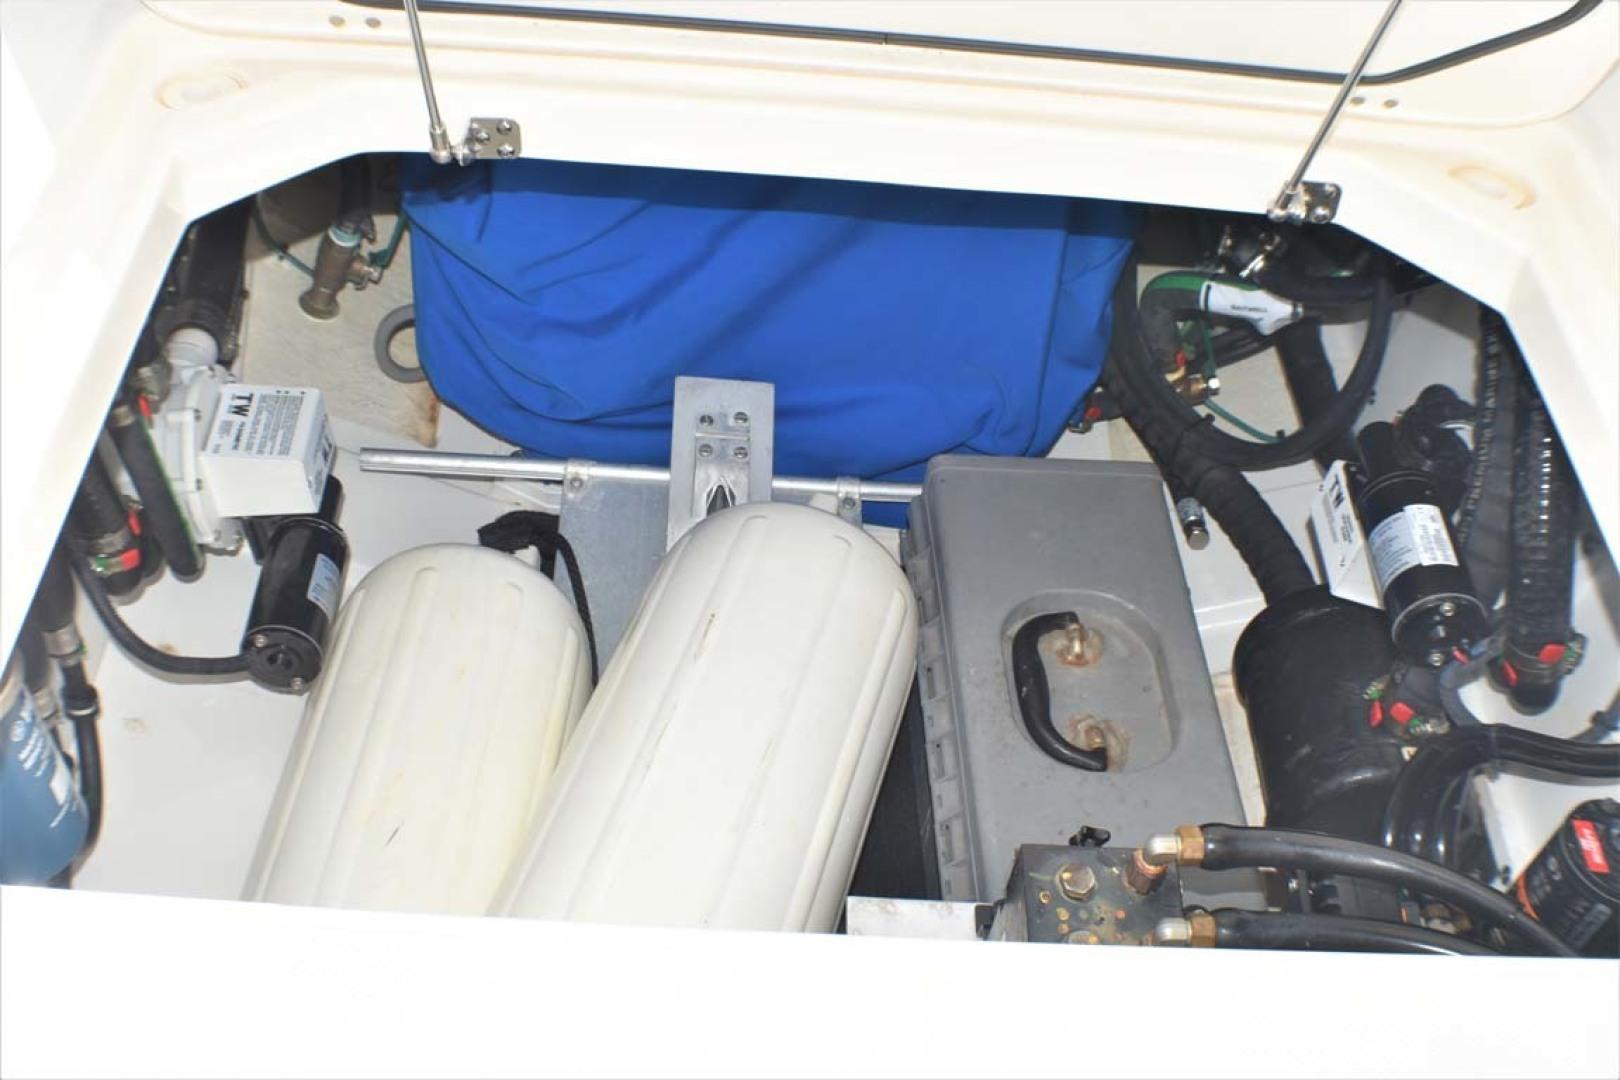 Pursuit-325 Offshore 2020-Coo Coo Miami-Florida-United States-Bilge-1475307 | Thumbnail